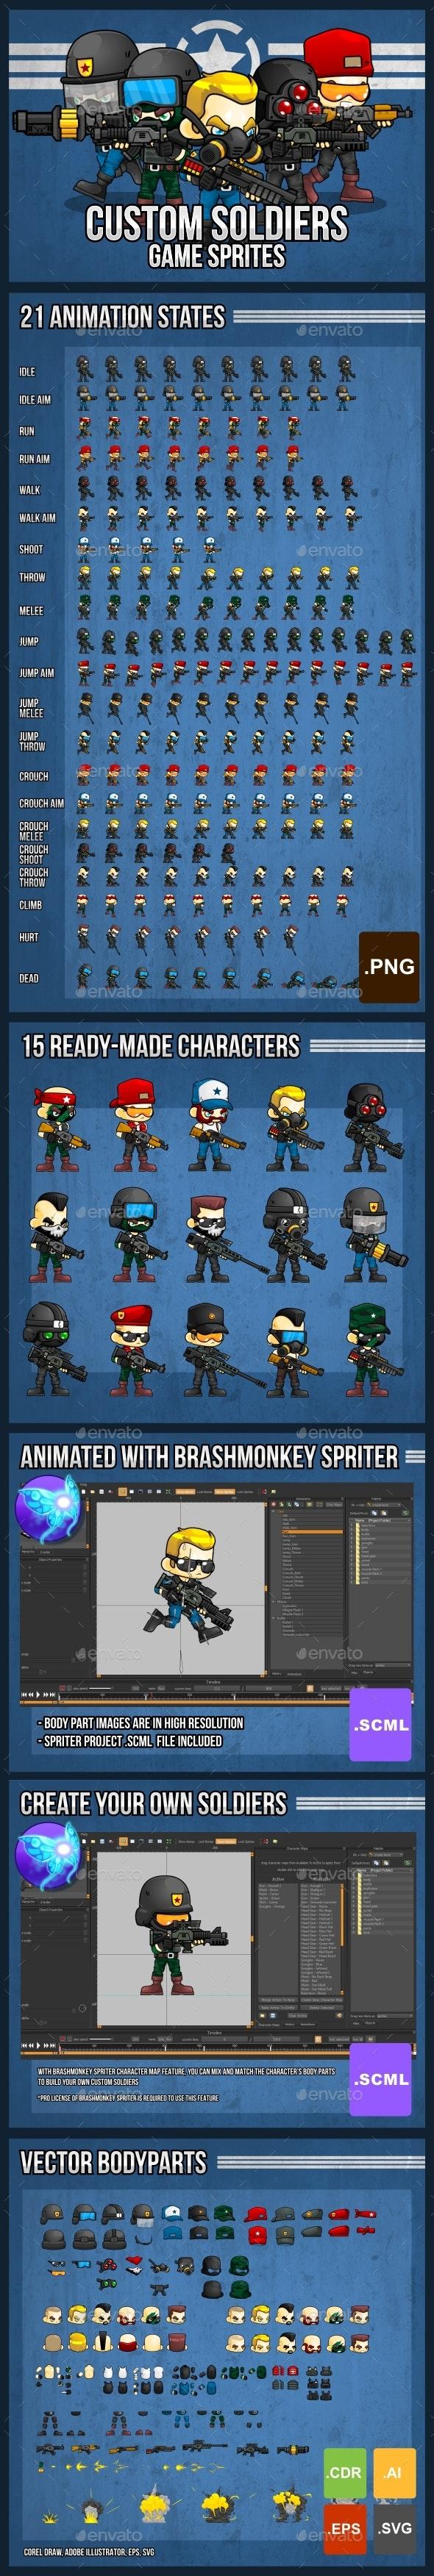 Custom Soldiers - Game Sprites - Sprites Game Assets